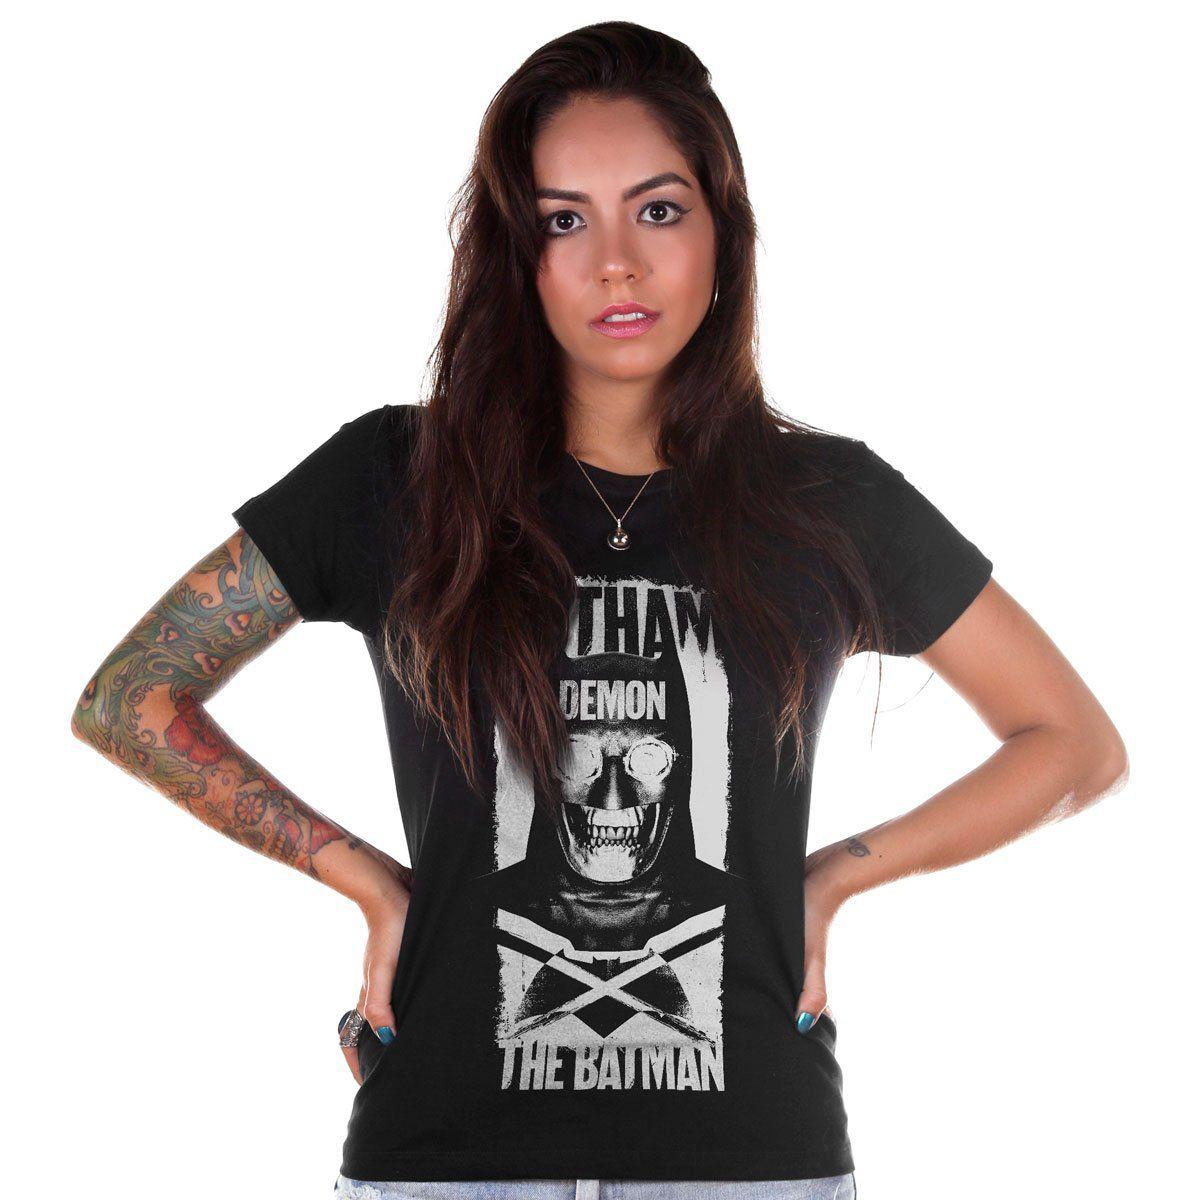 Camiseta Feminina Batman VS Superman Gotham Demon  - bandUP Store Marketplace